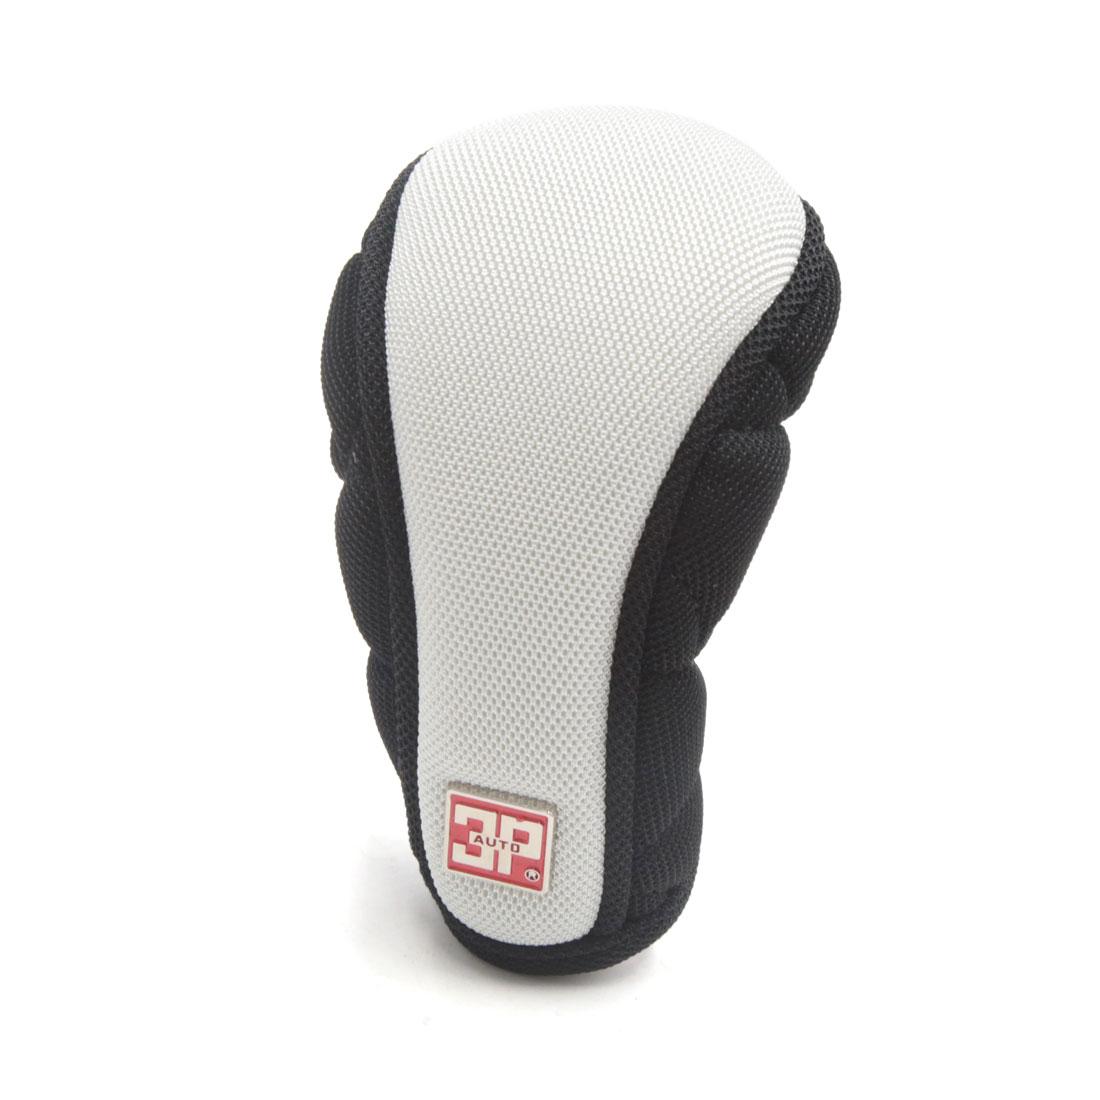 Black White Zipper Closure Microfiber Car Gear Shift Knob Shifter Cover